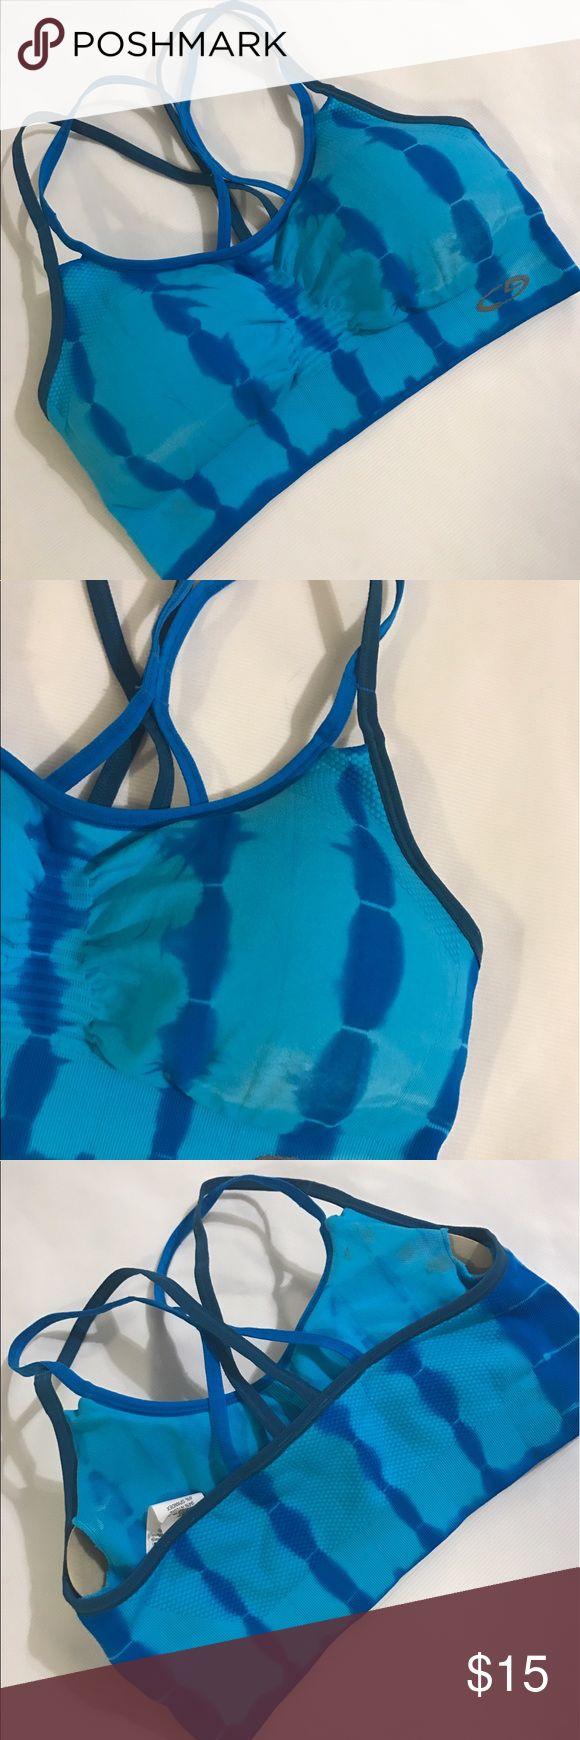 Champion duo dry sports bra Virtually new Champion Intimates & Sleepwear Bras